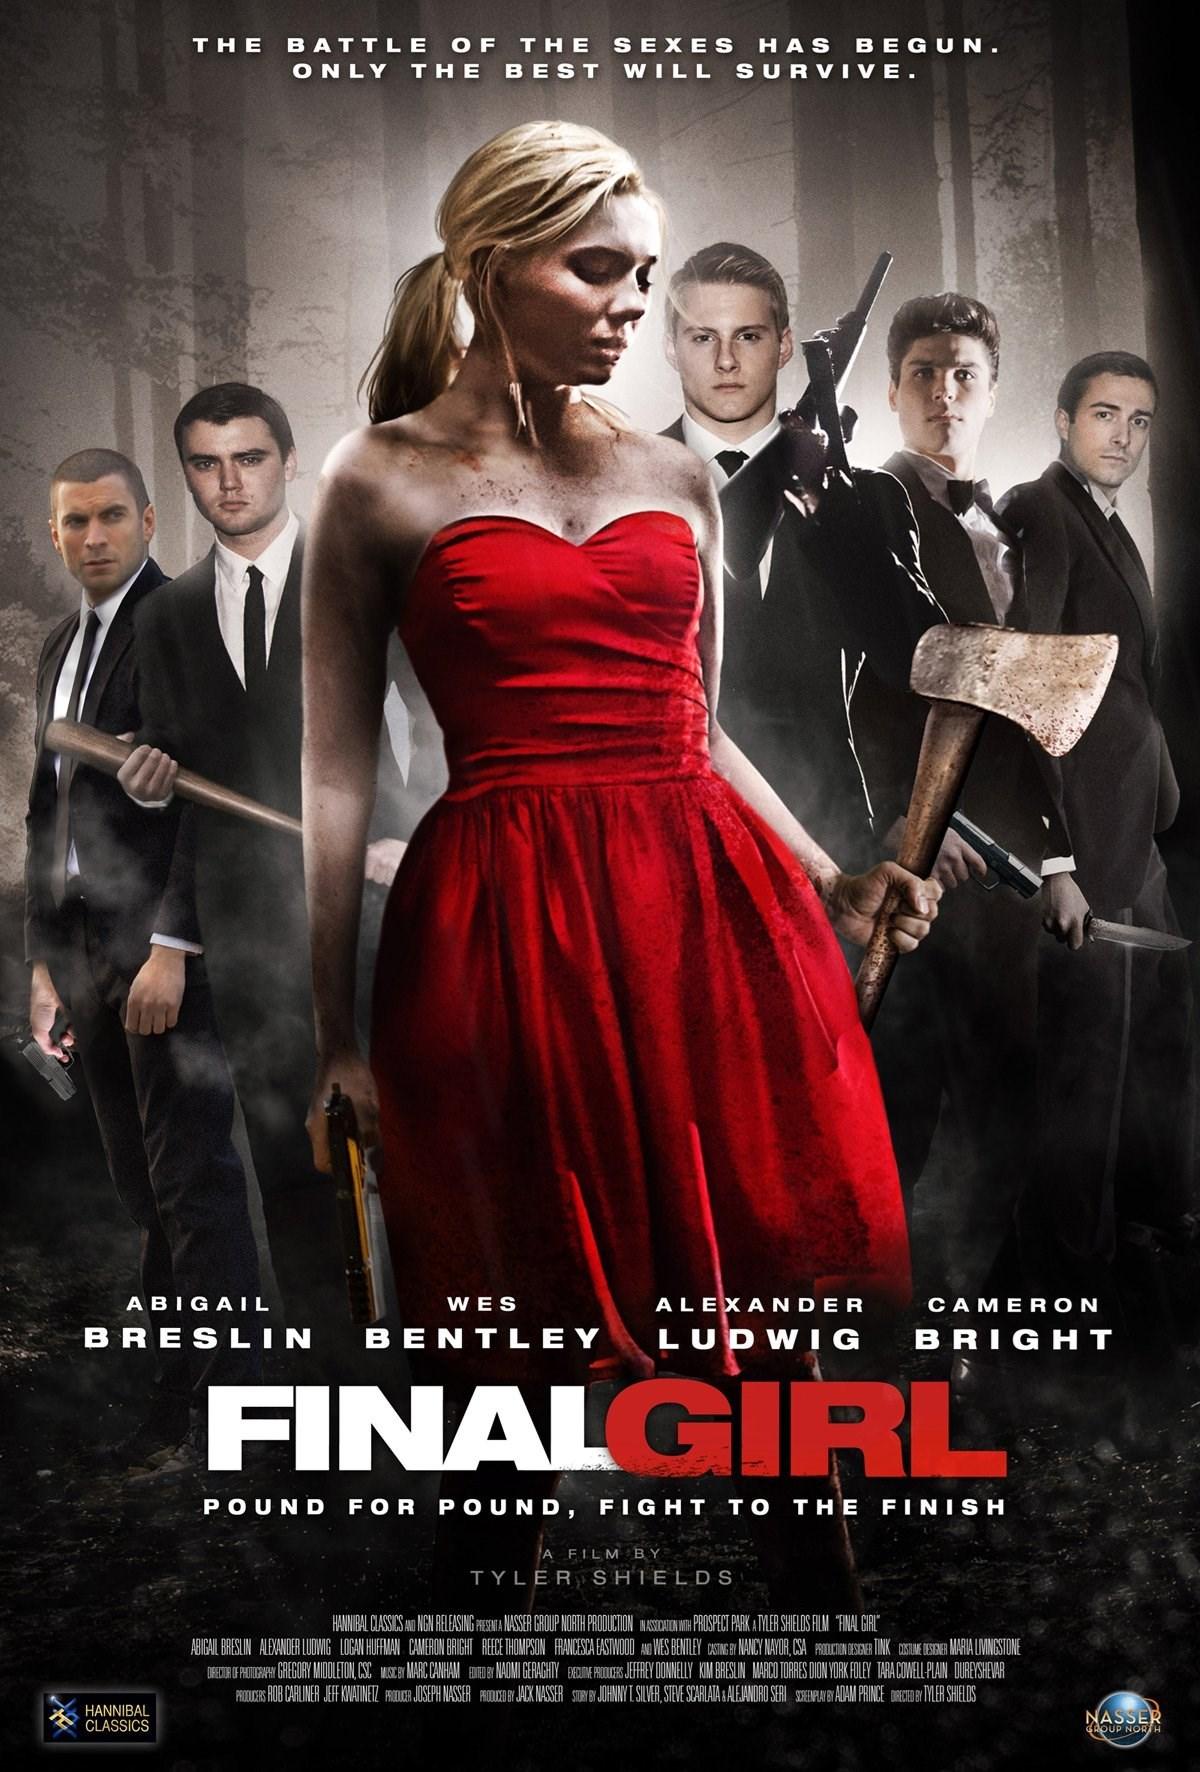 FINAL GIRL (1)